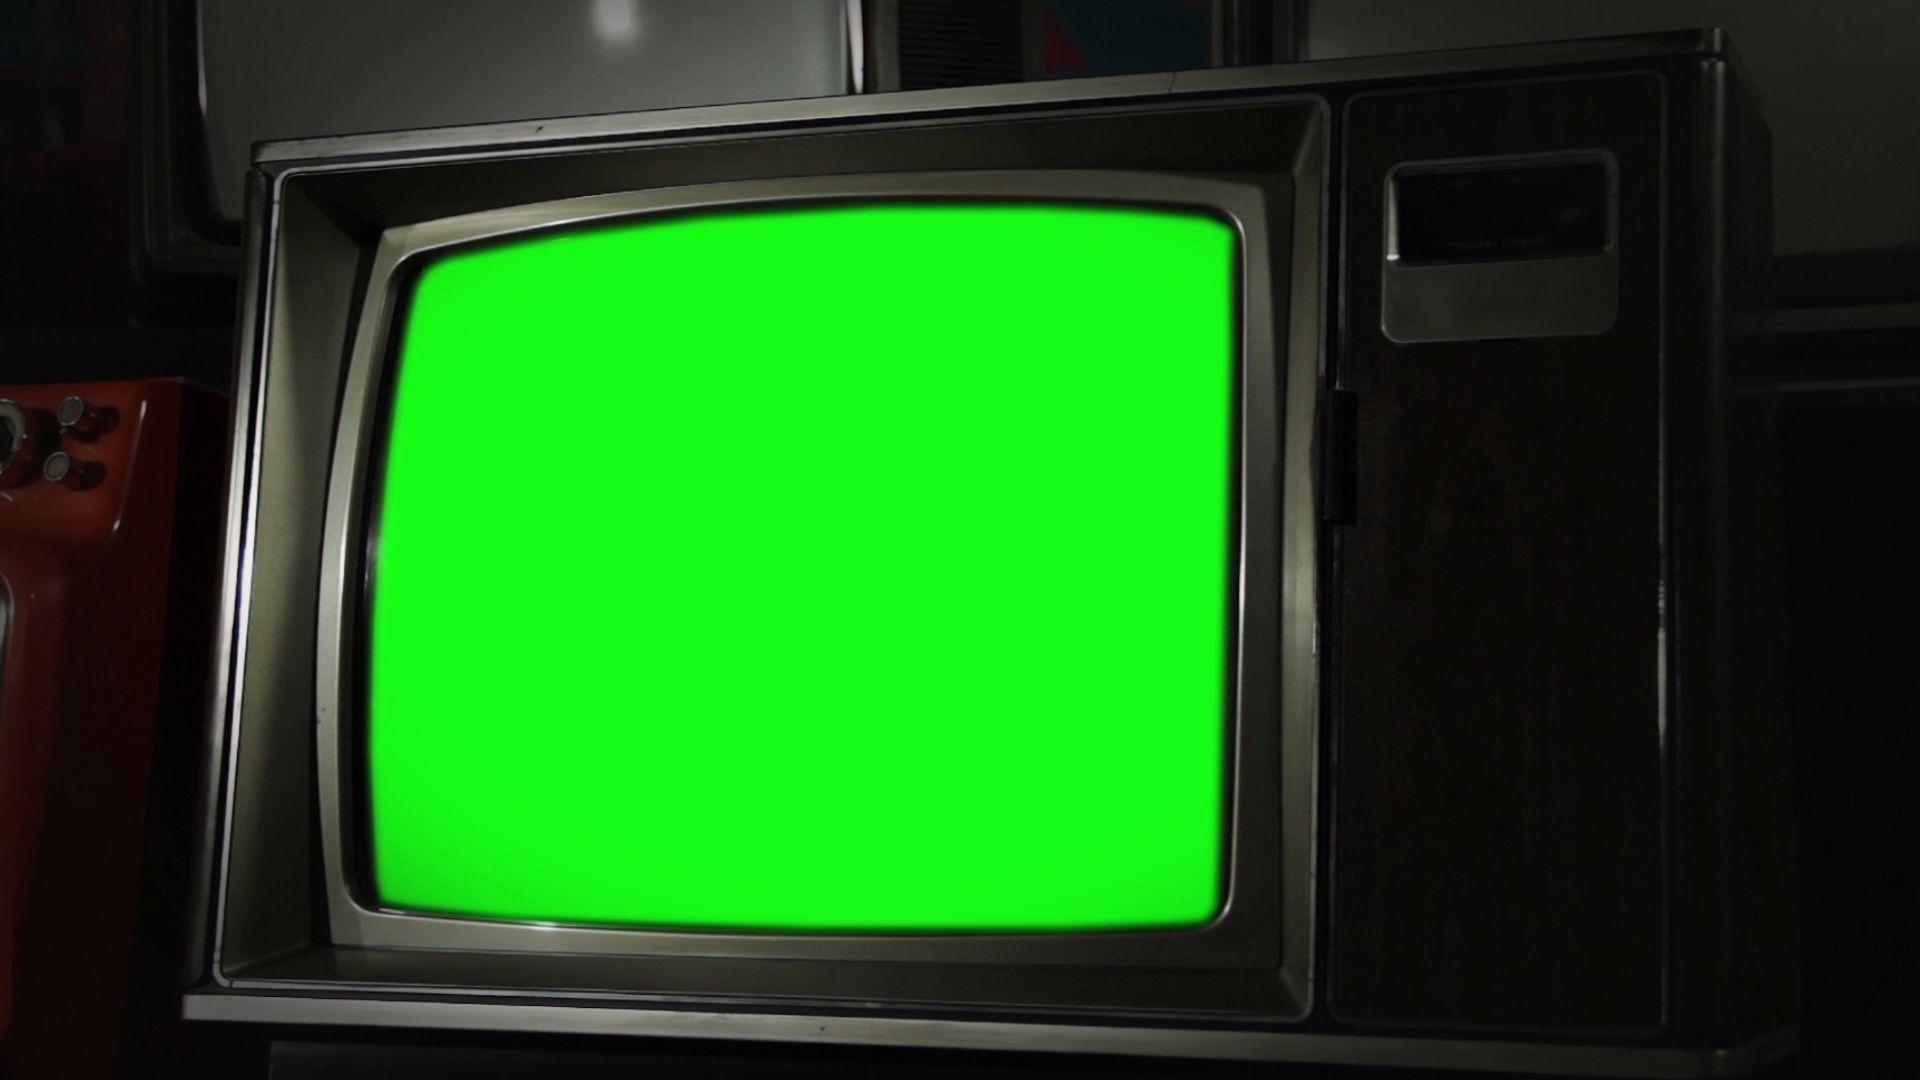 Vintage Green Screen Tv Stock Footage Ad Screen Green Vintage Footage Vintage Tv Greenscreen Chroma Key